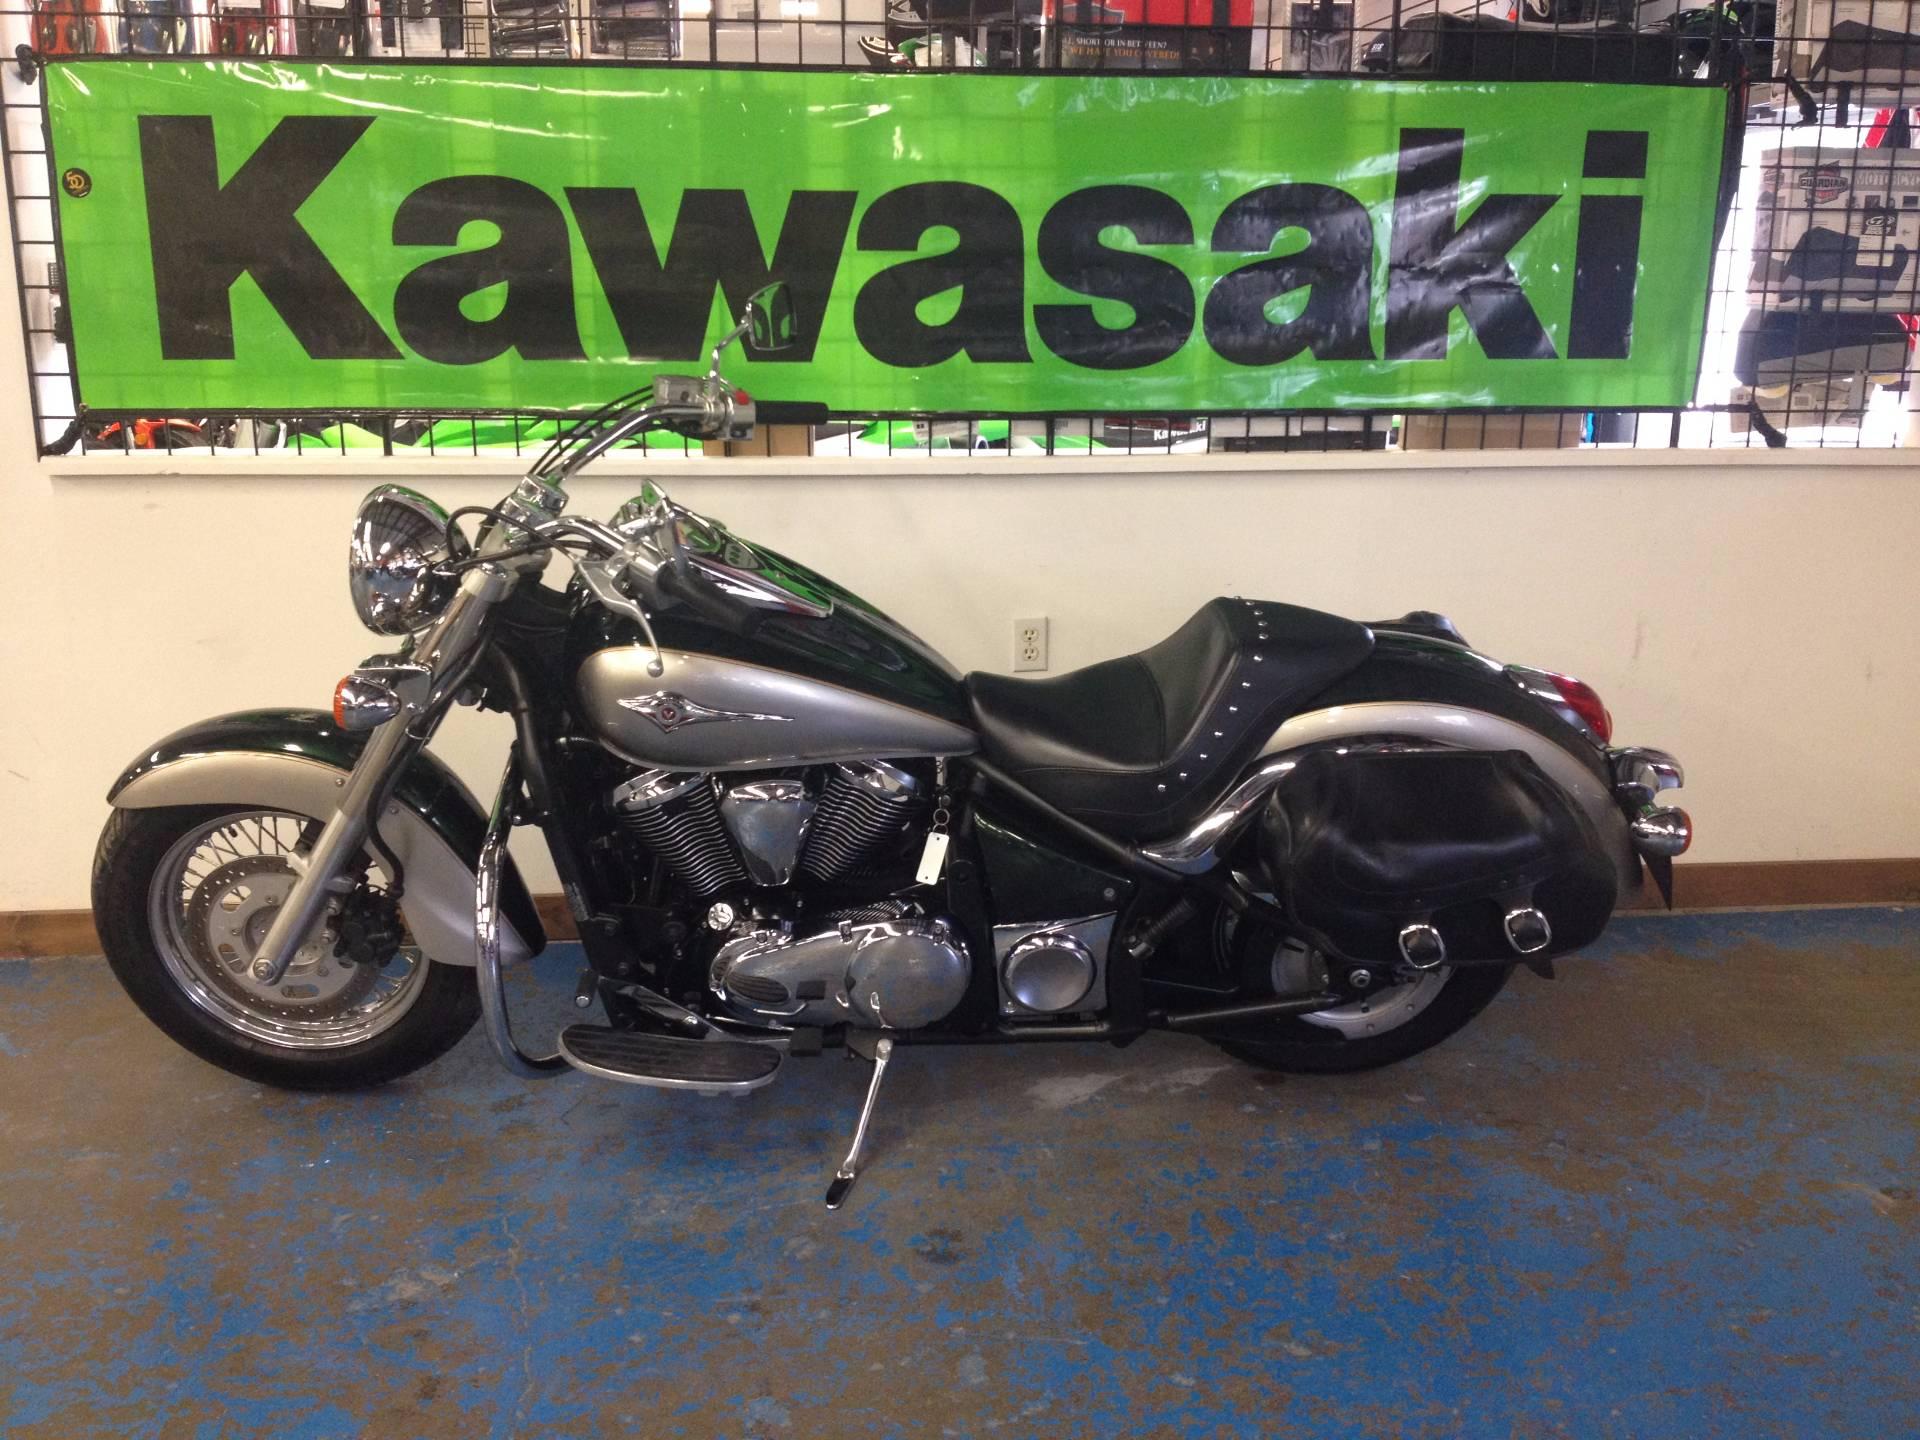 Used 2009 Kawasaki Vulcan® 900 Classic Motorcycles in Nevada, IA